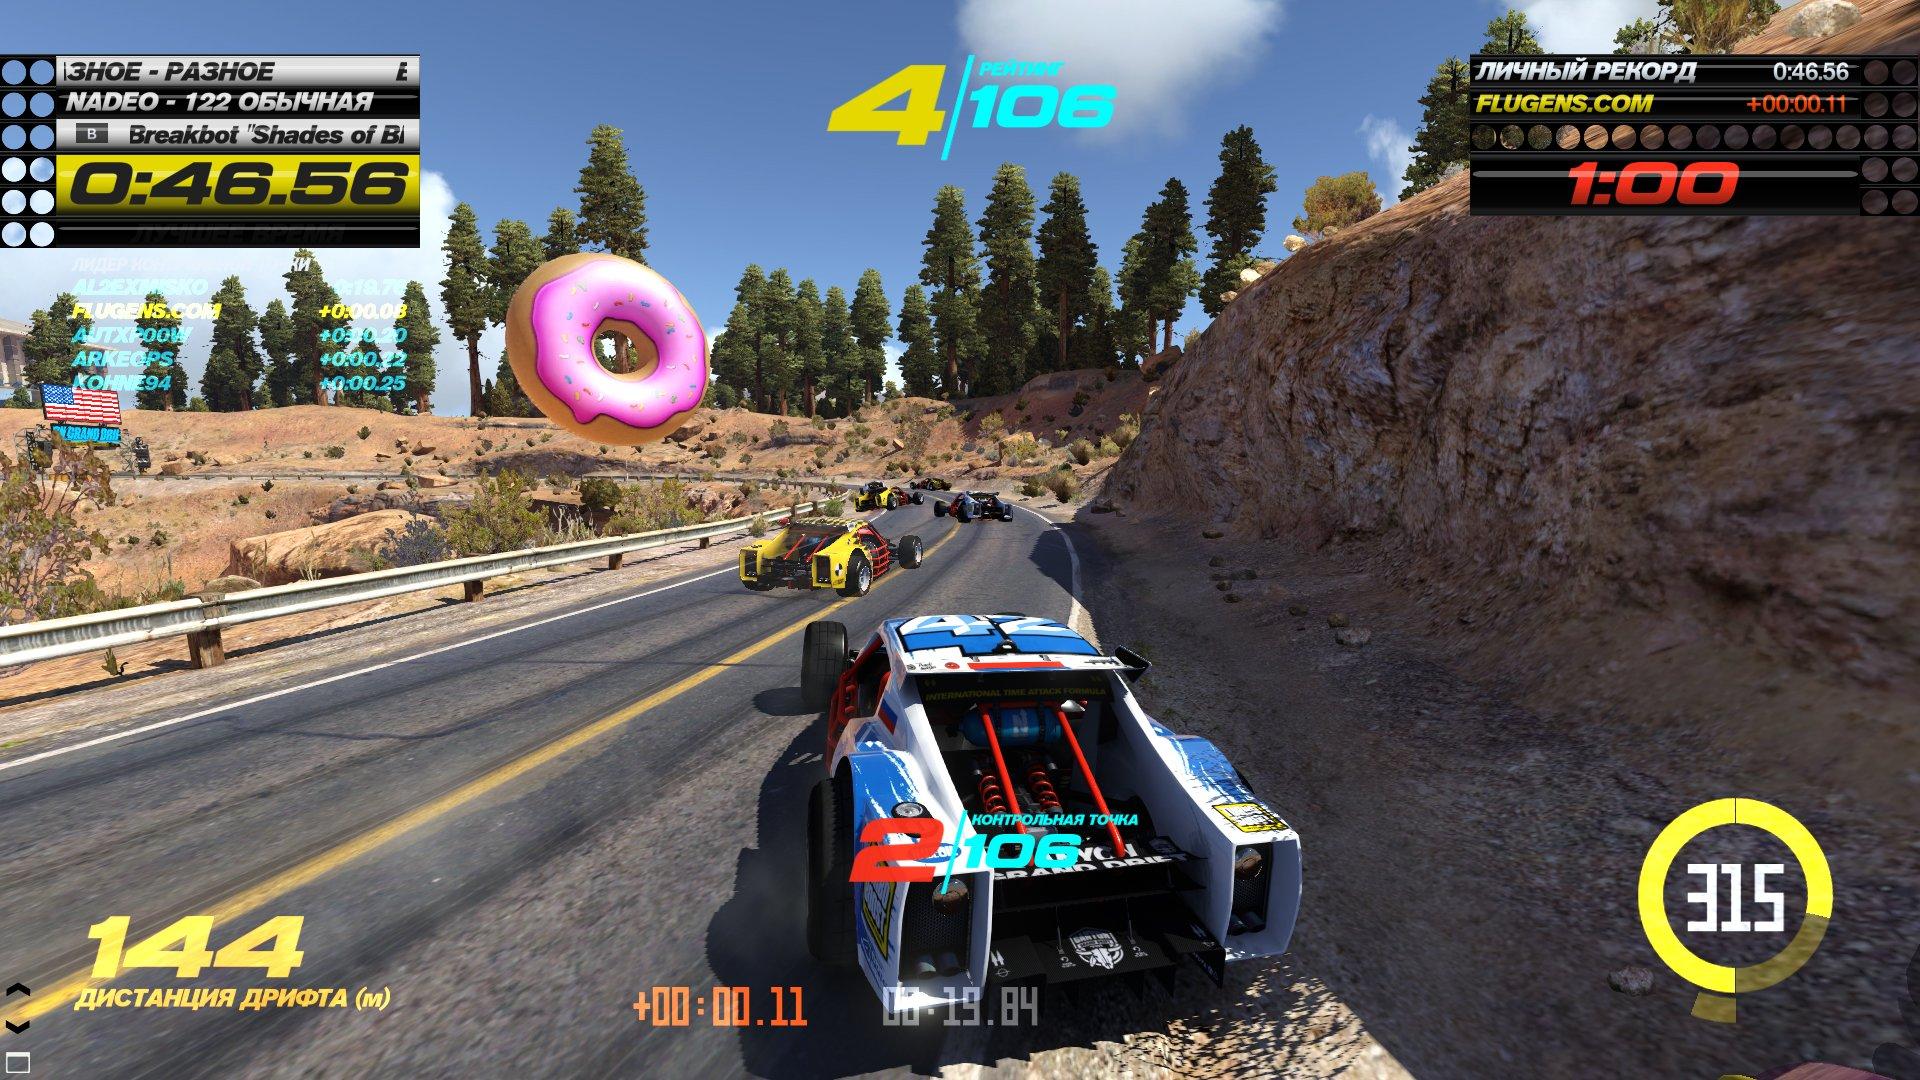 Обзор TrackMania Turbo. - Изображение 3